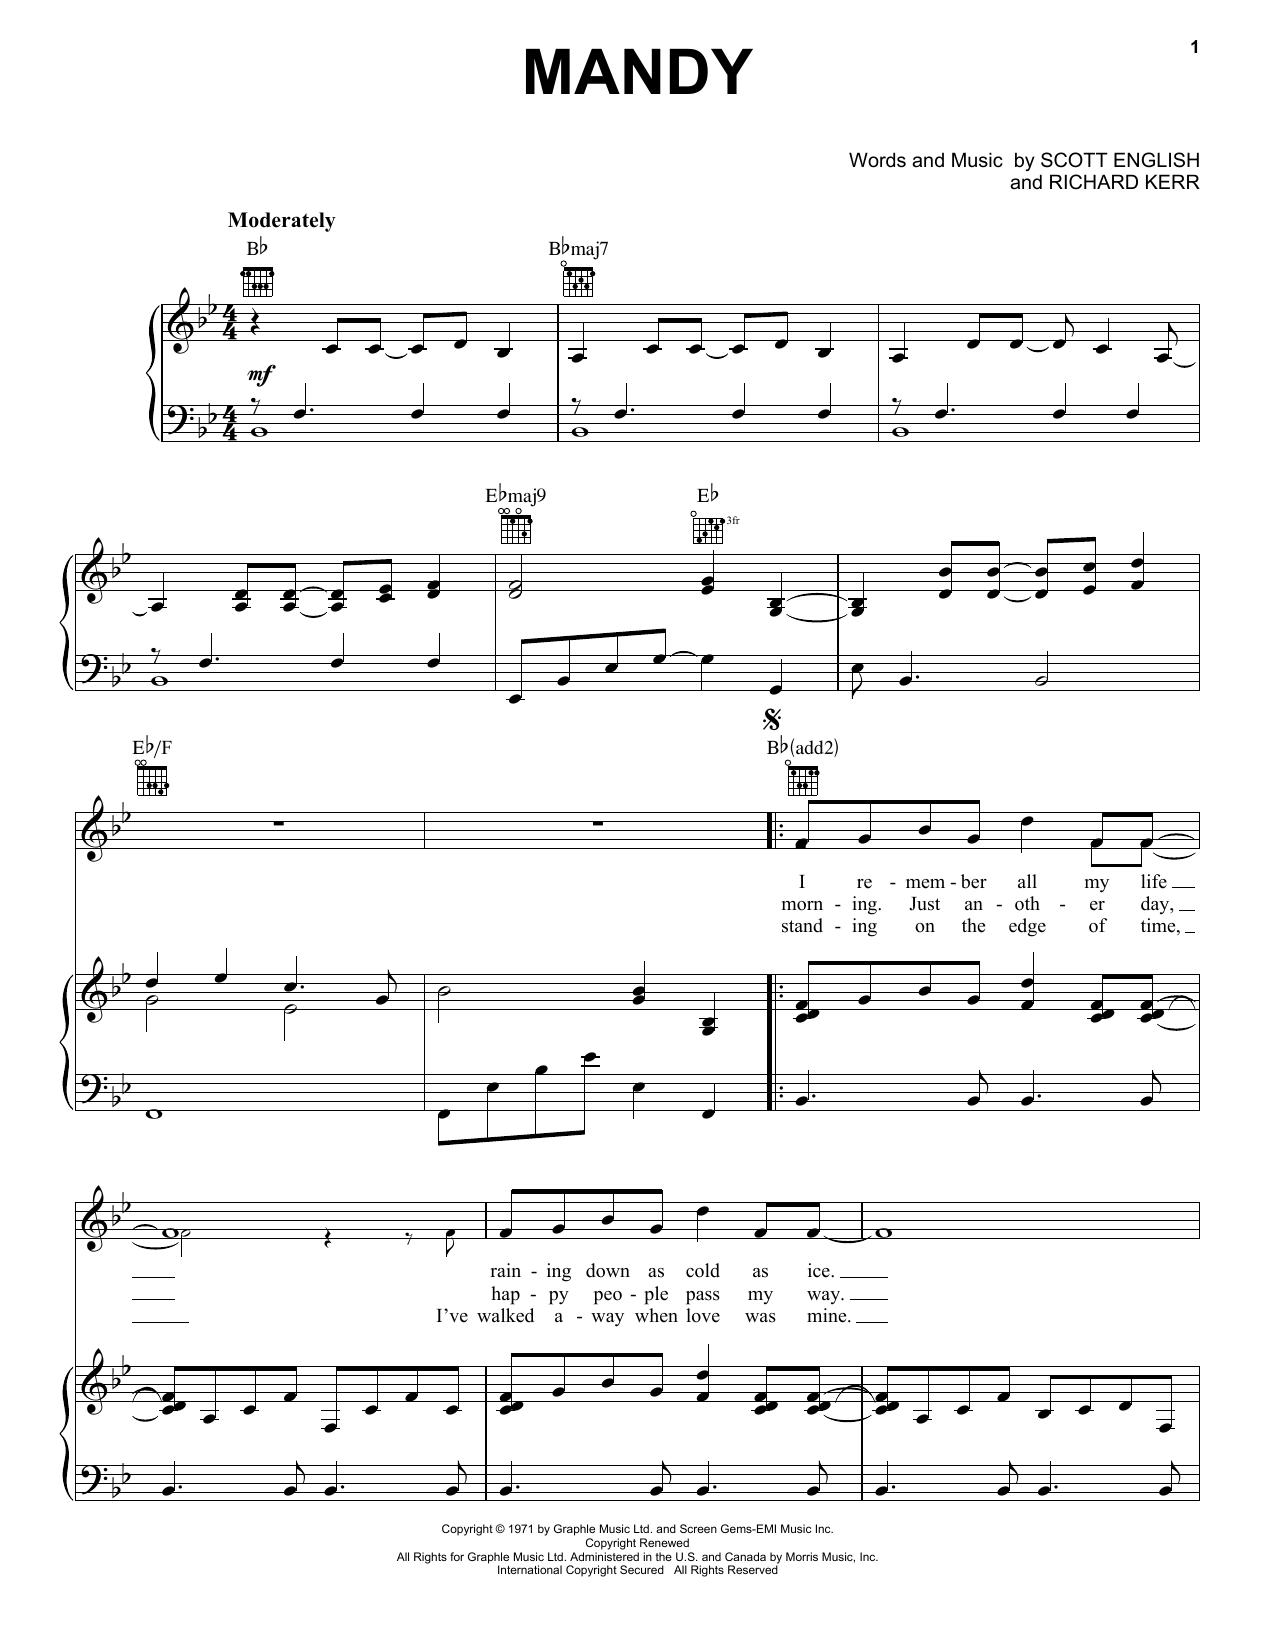 Mandy sheet music